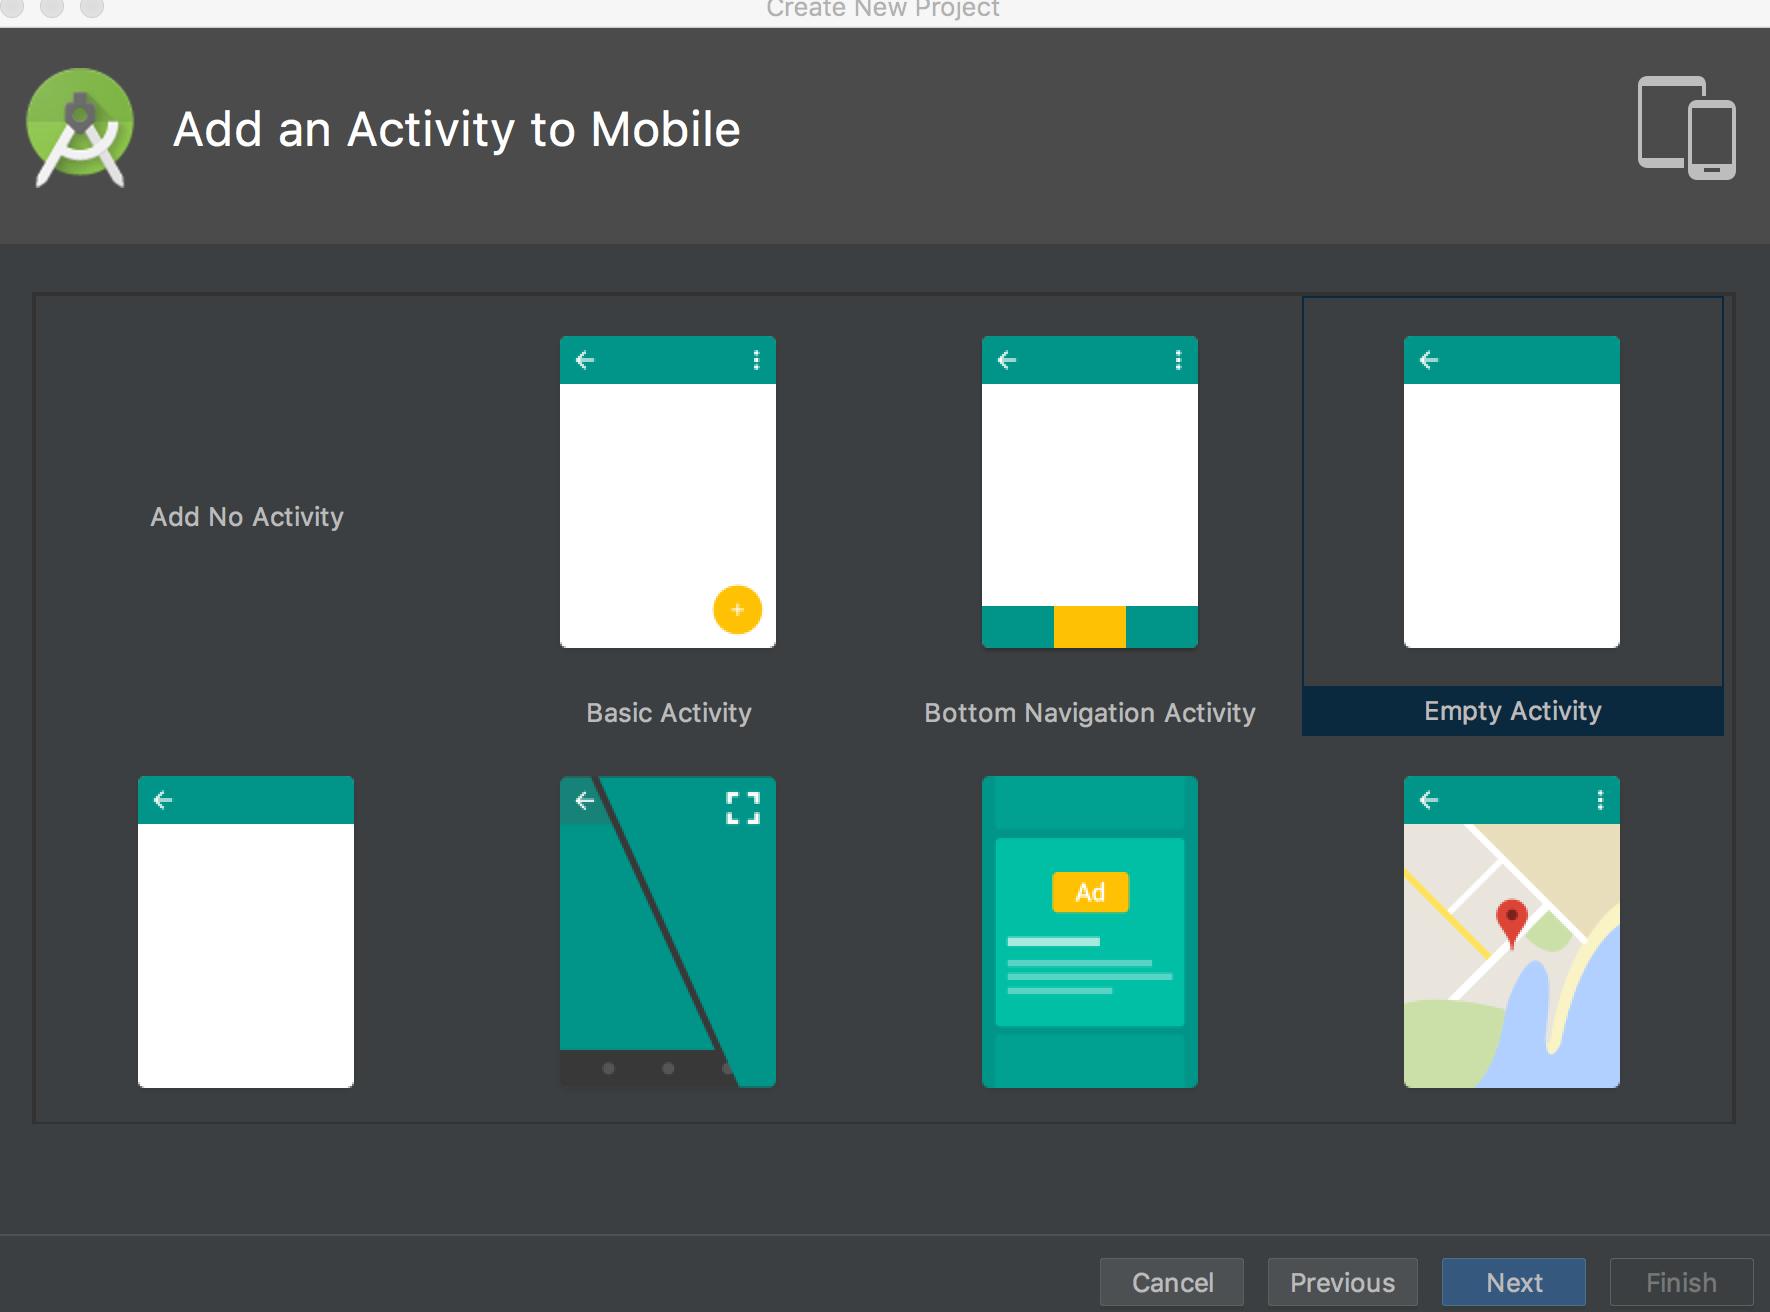 Select Empty Activity